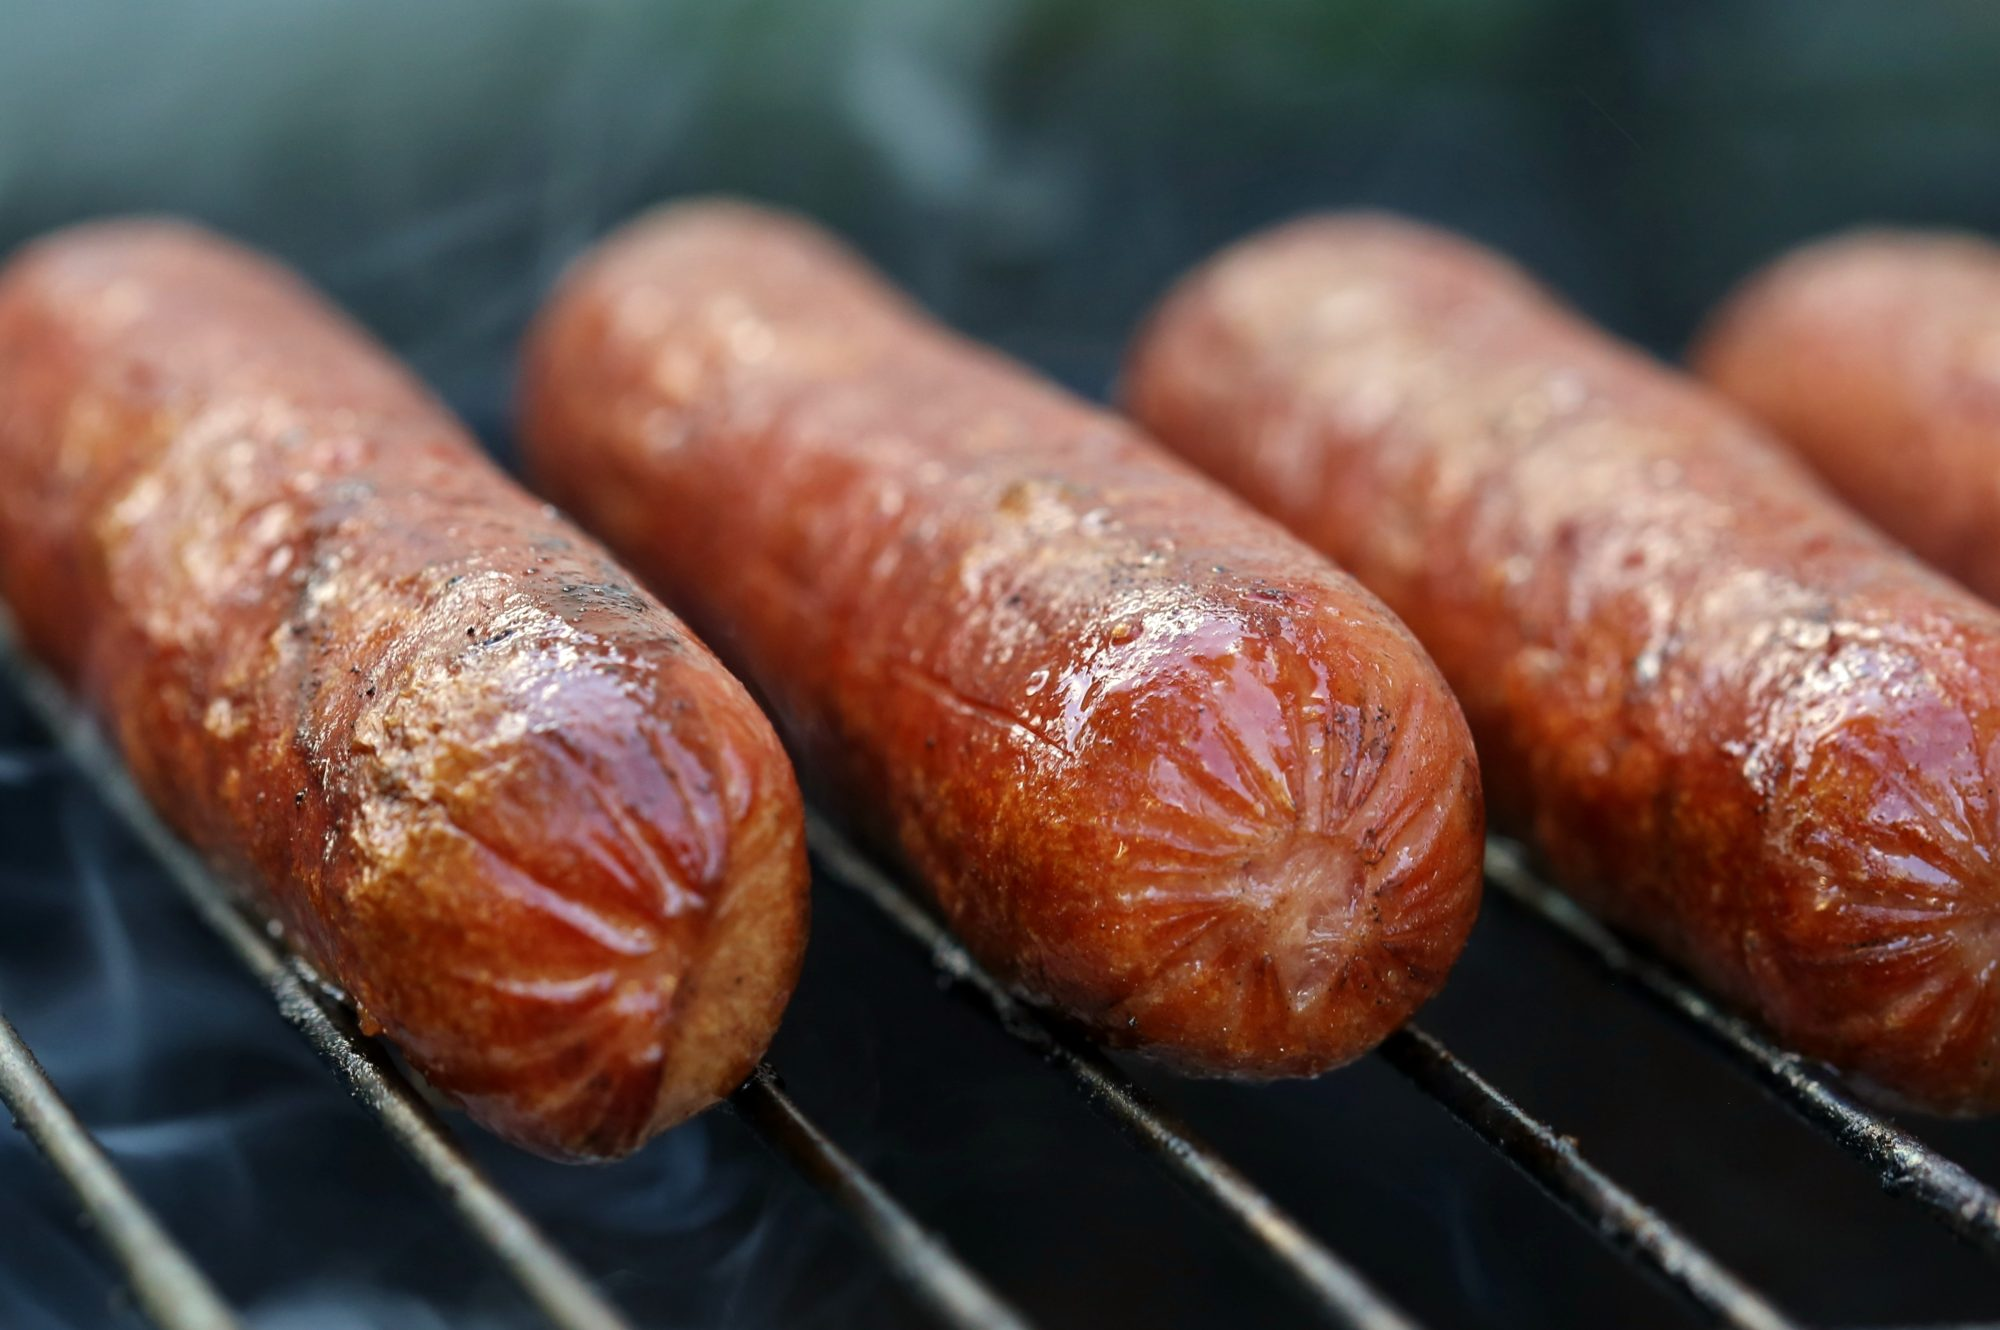 getty hotdogs 020419